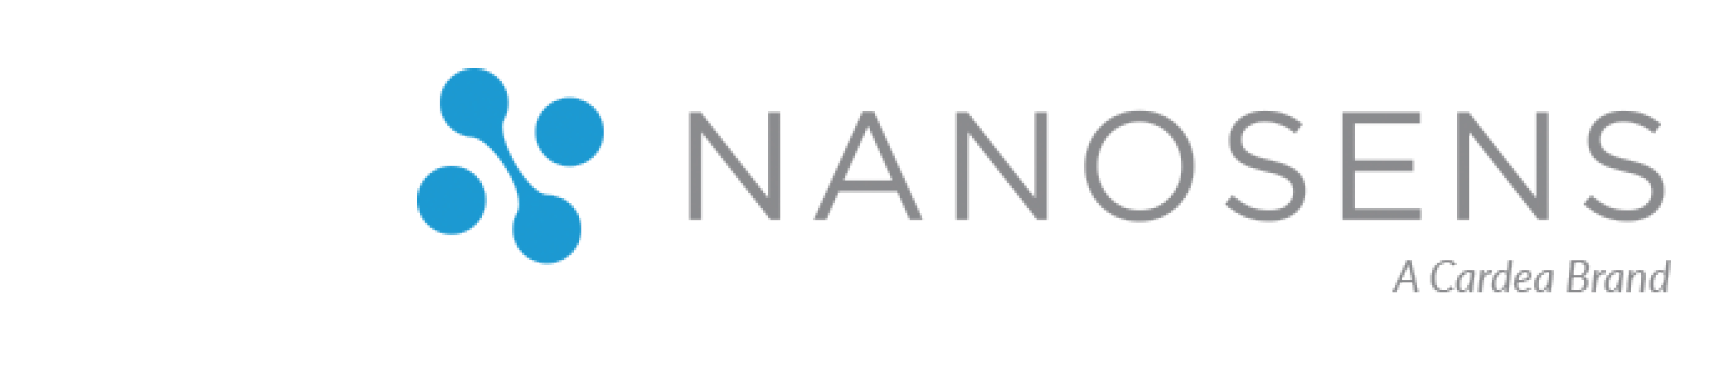 Nanosense and Cardea Merger - Nanosense, co-founded by Dr. Aran has announced a new merger with Cardea Bio.